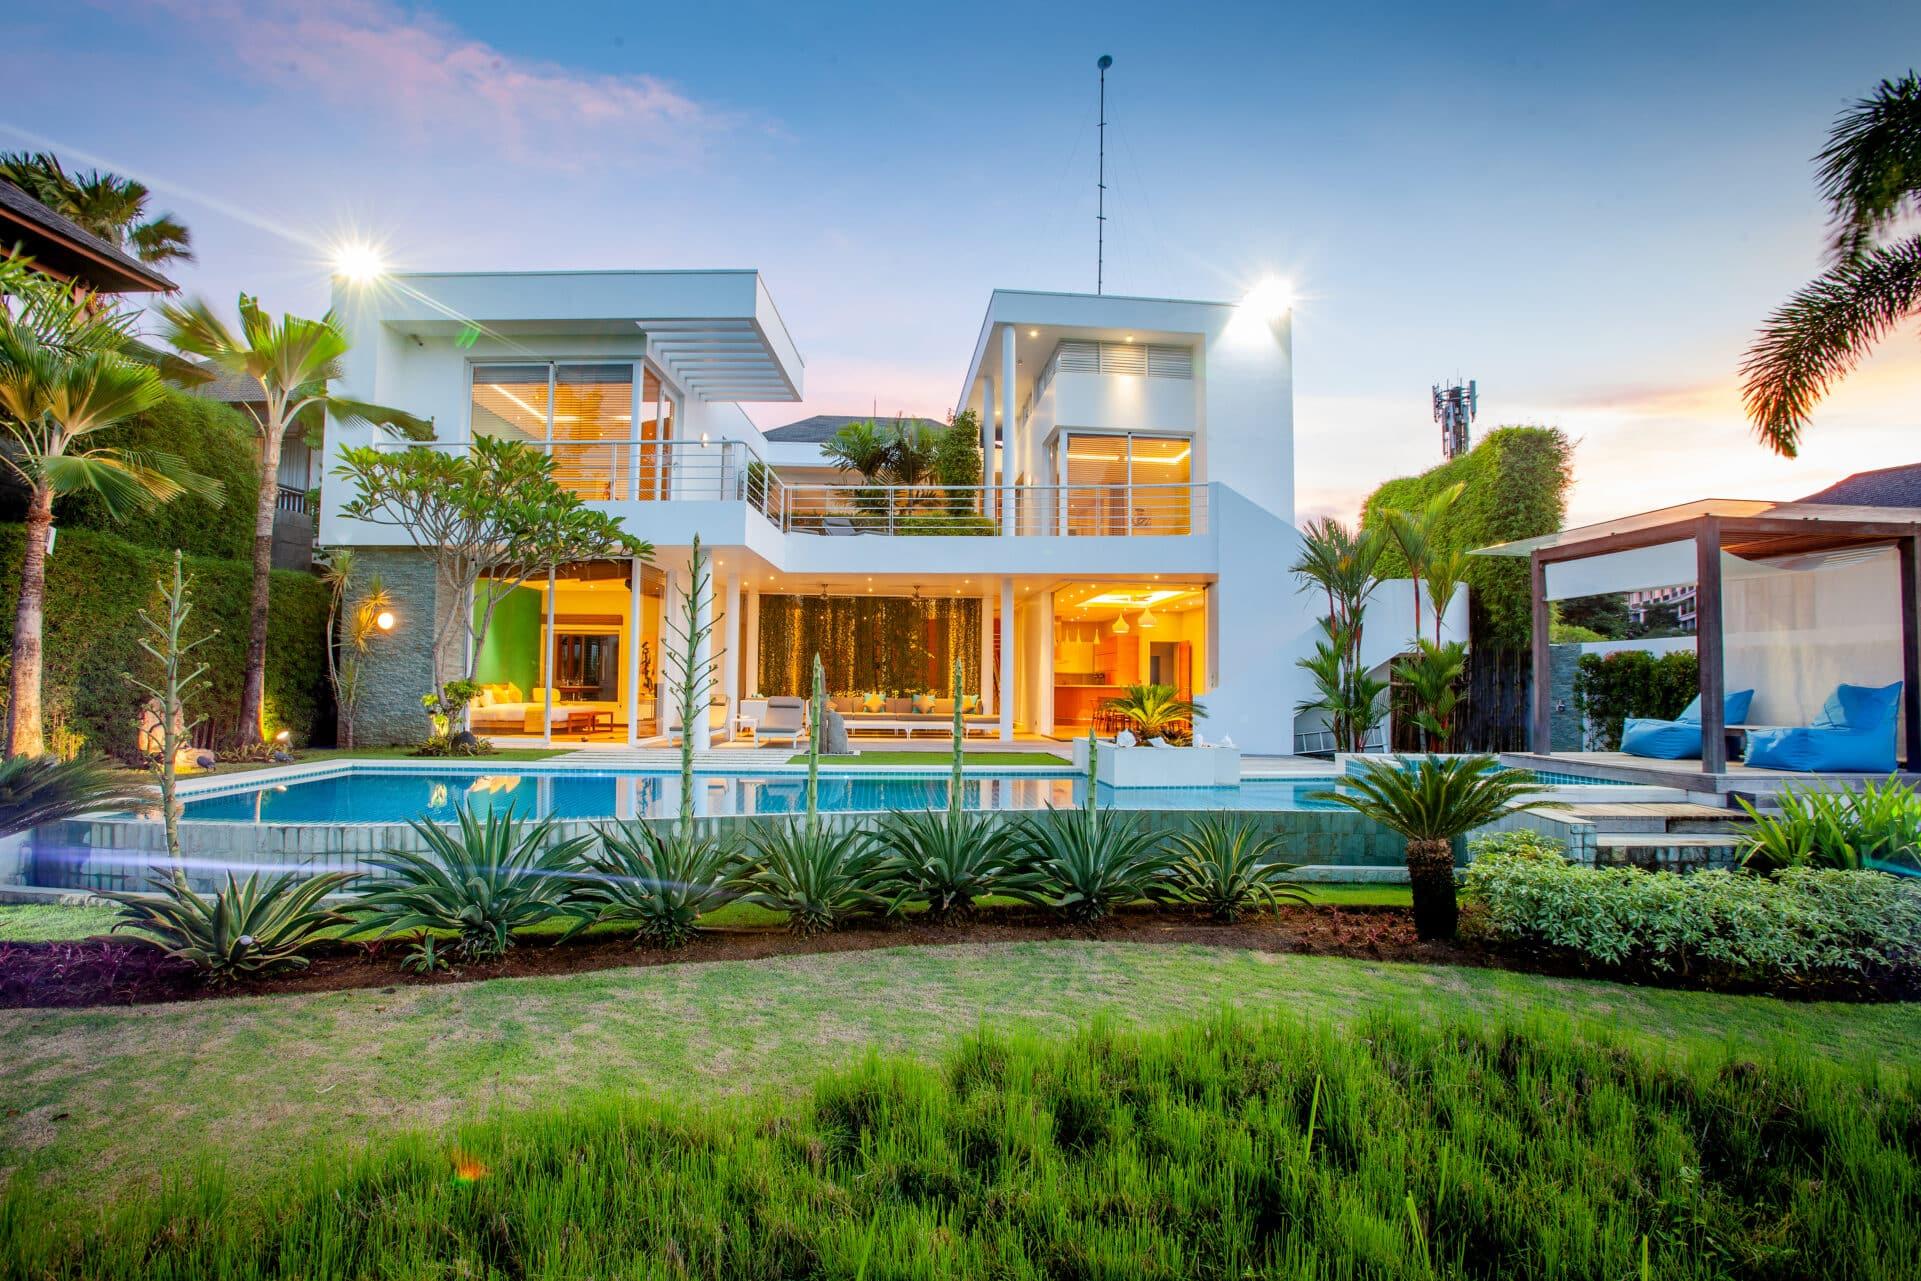 Modern 4 bedroom villa overlooking New kuta Golf course